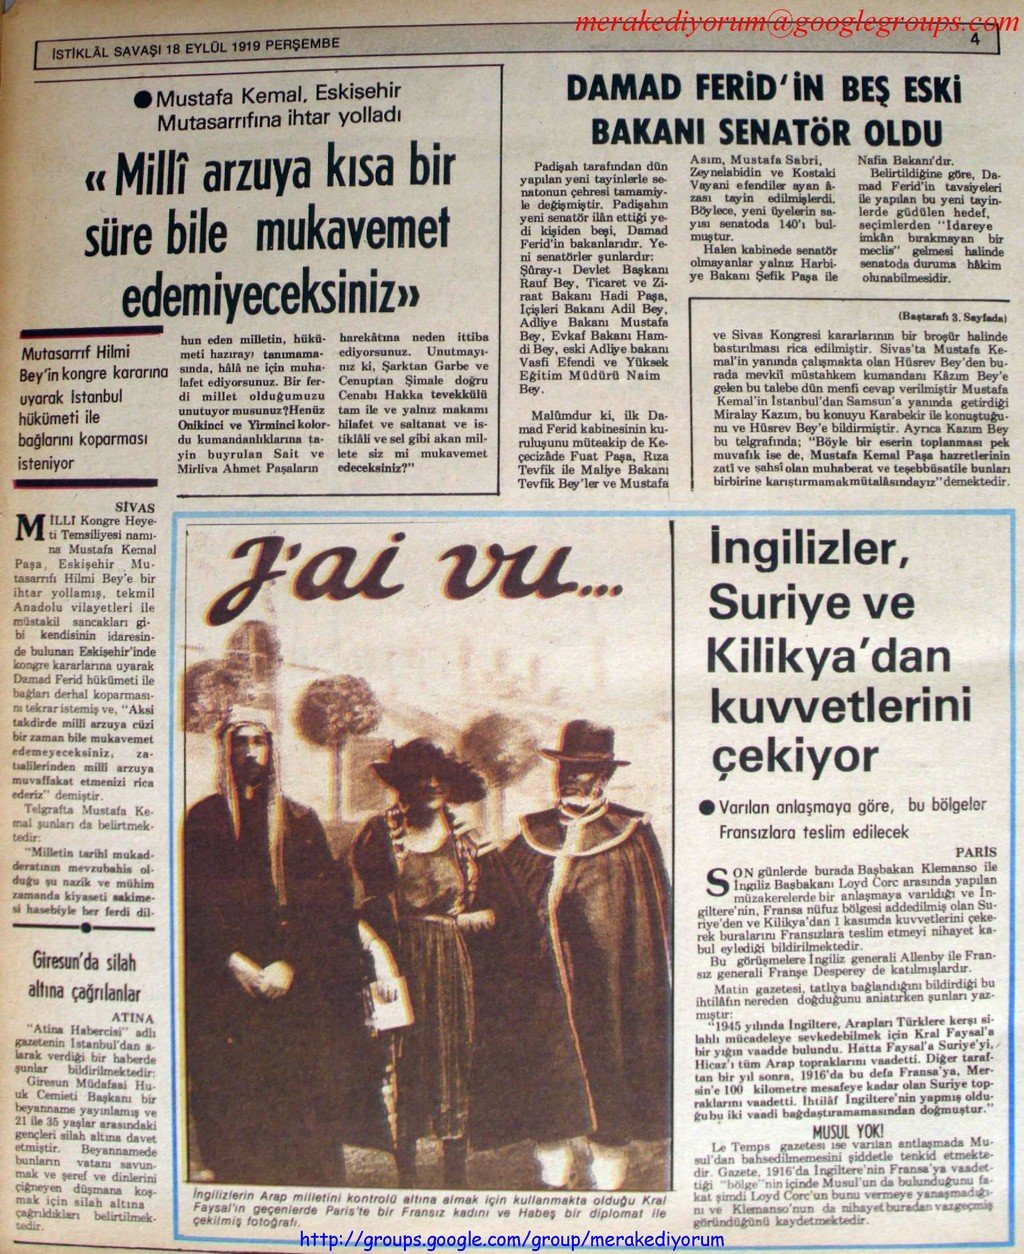 istiklal savaşı gazetesi - 18 eylül 1919